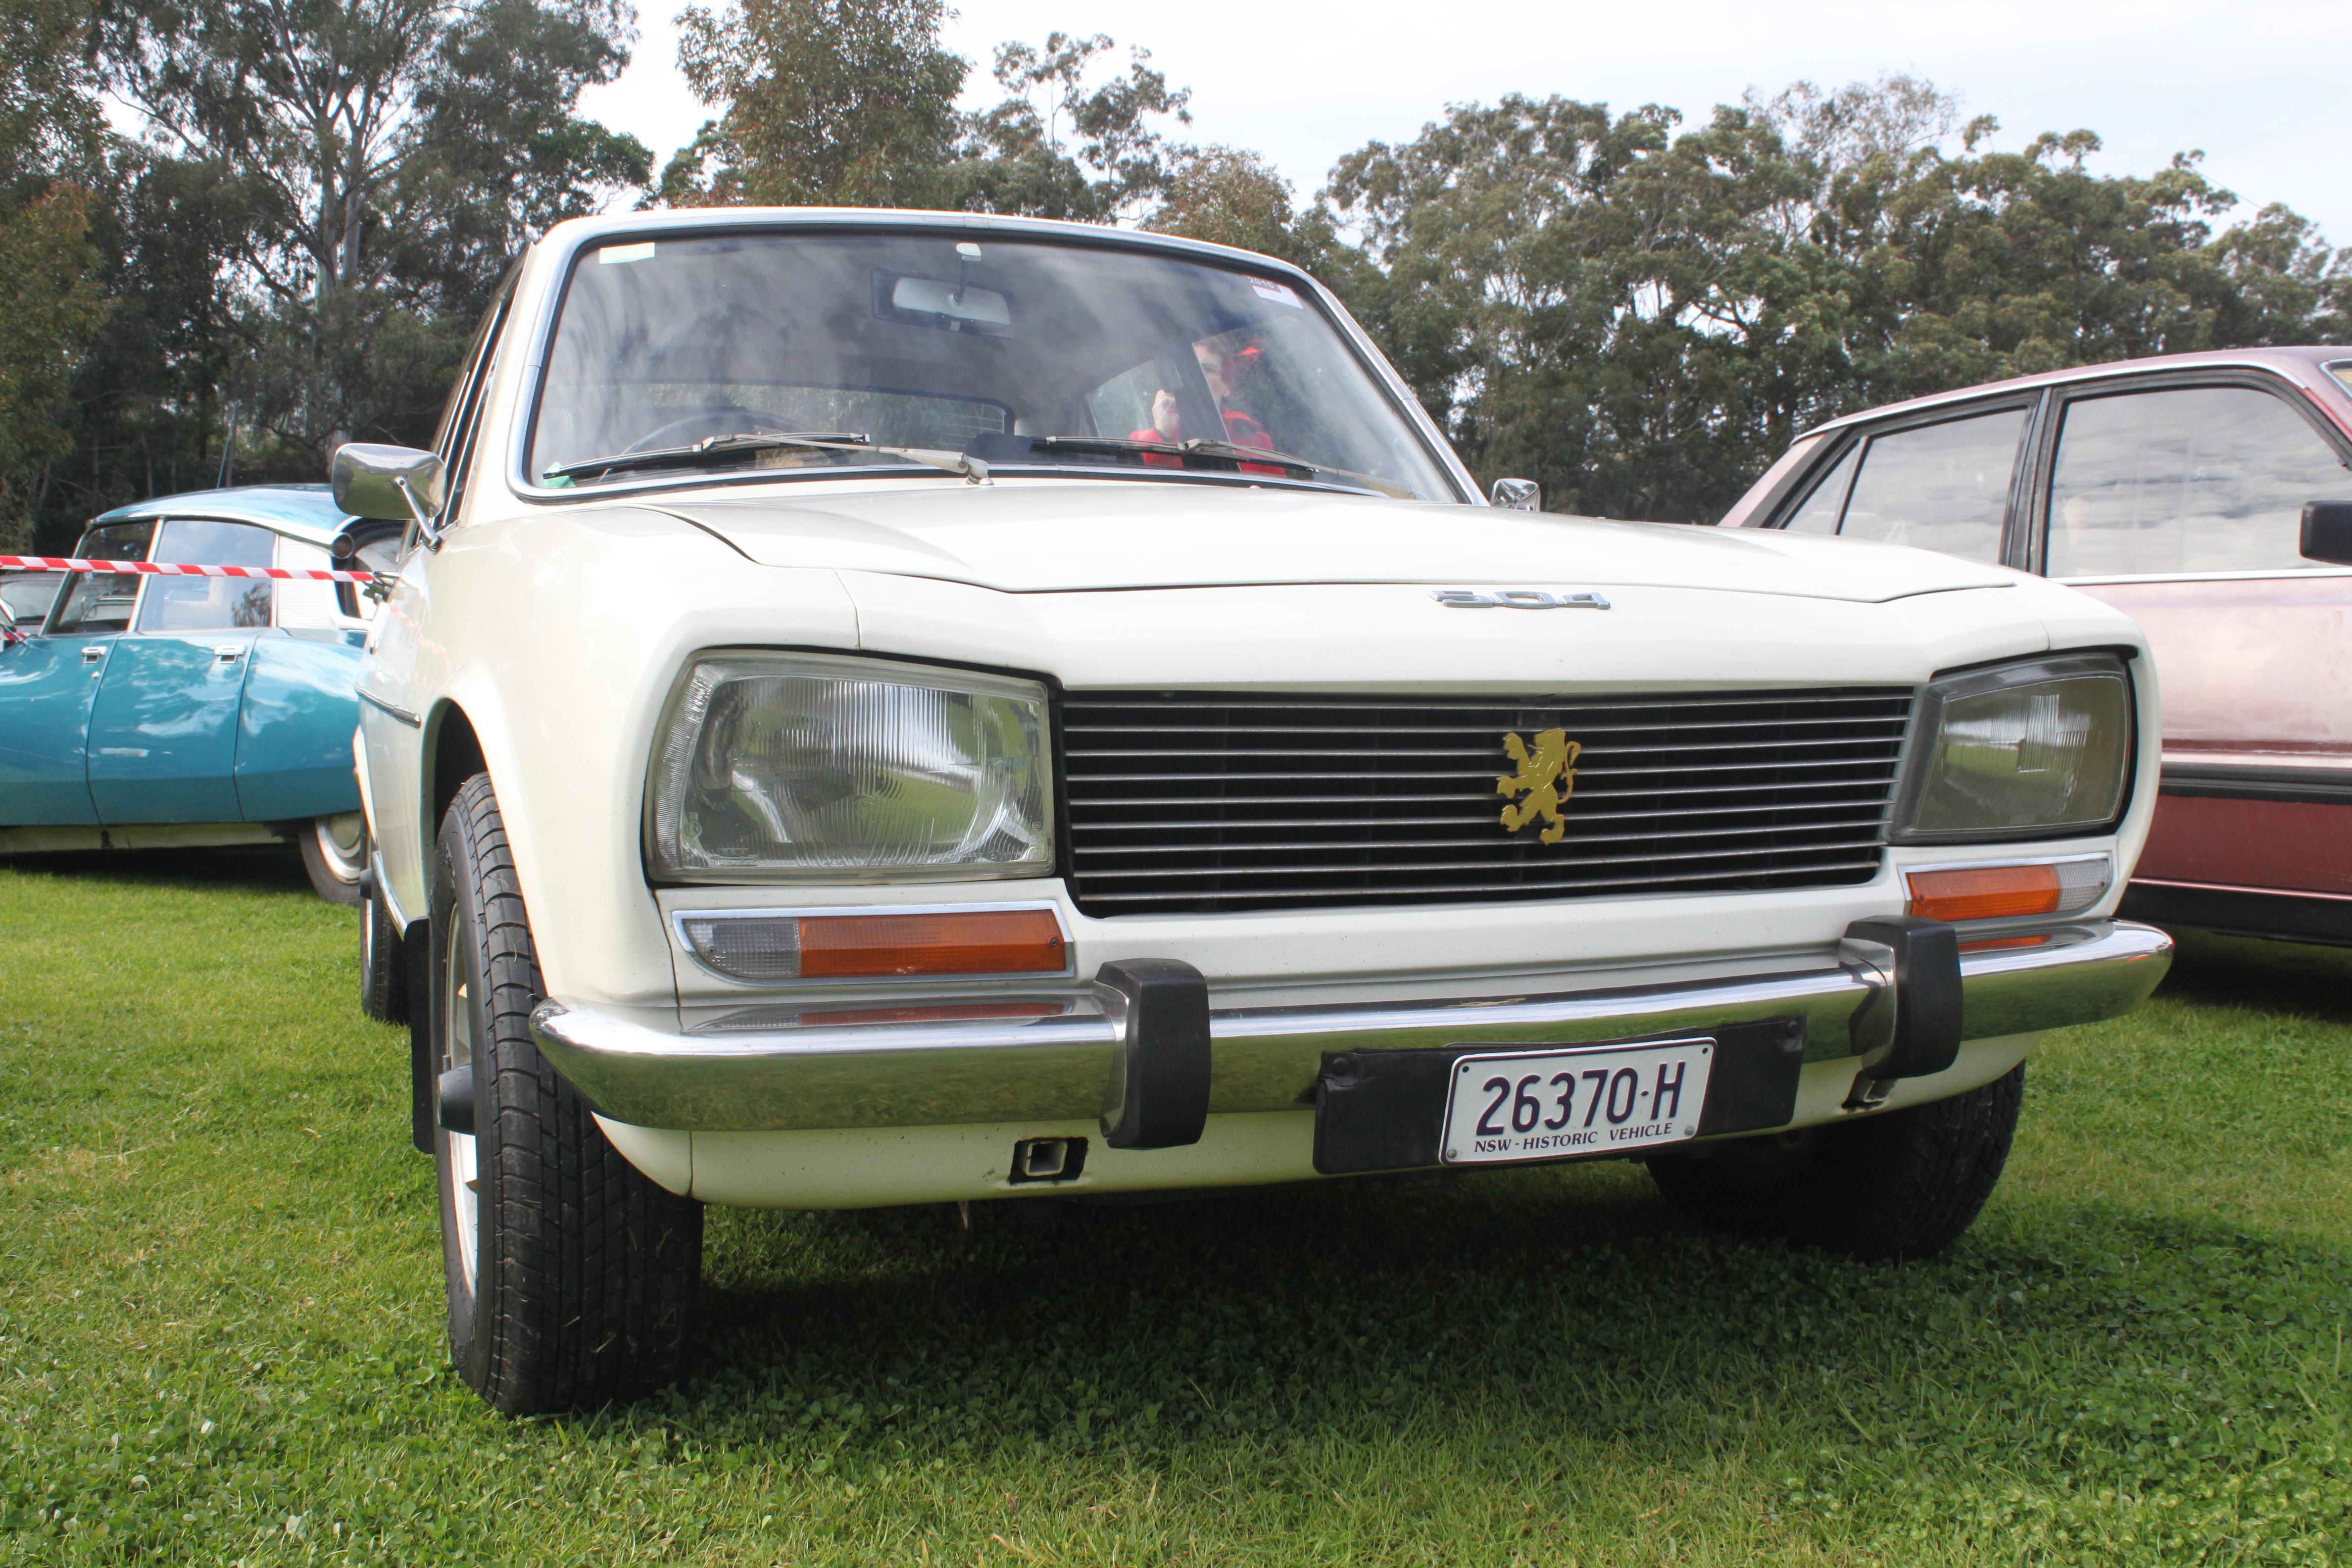 file:1970 peugeot 504 sedan (19581787478) - wikimedia commons